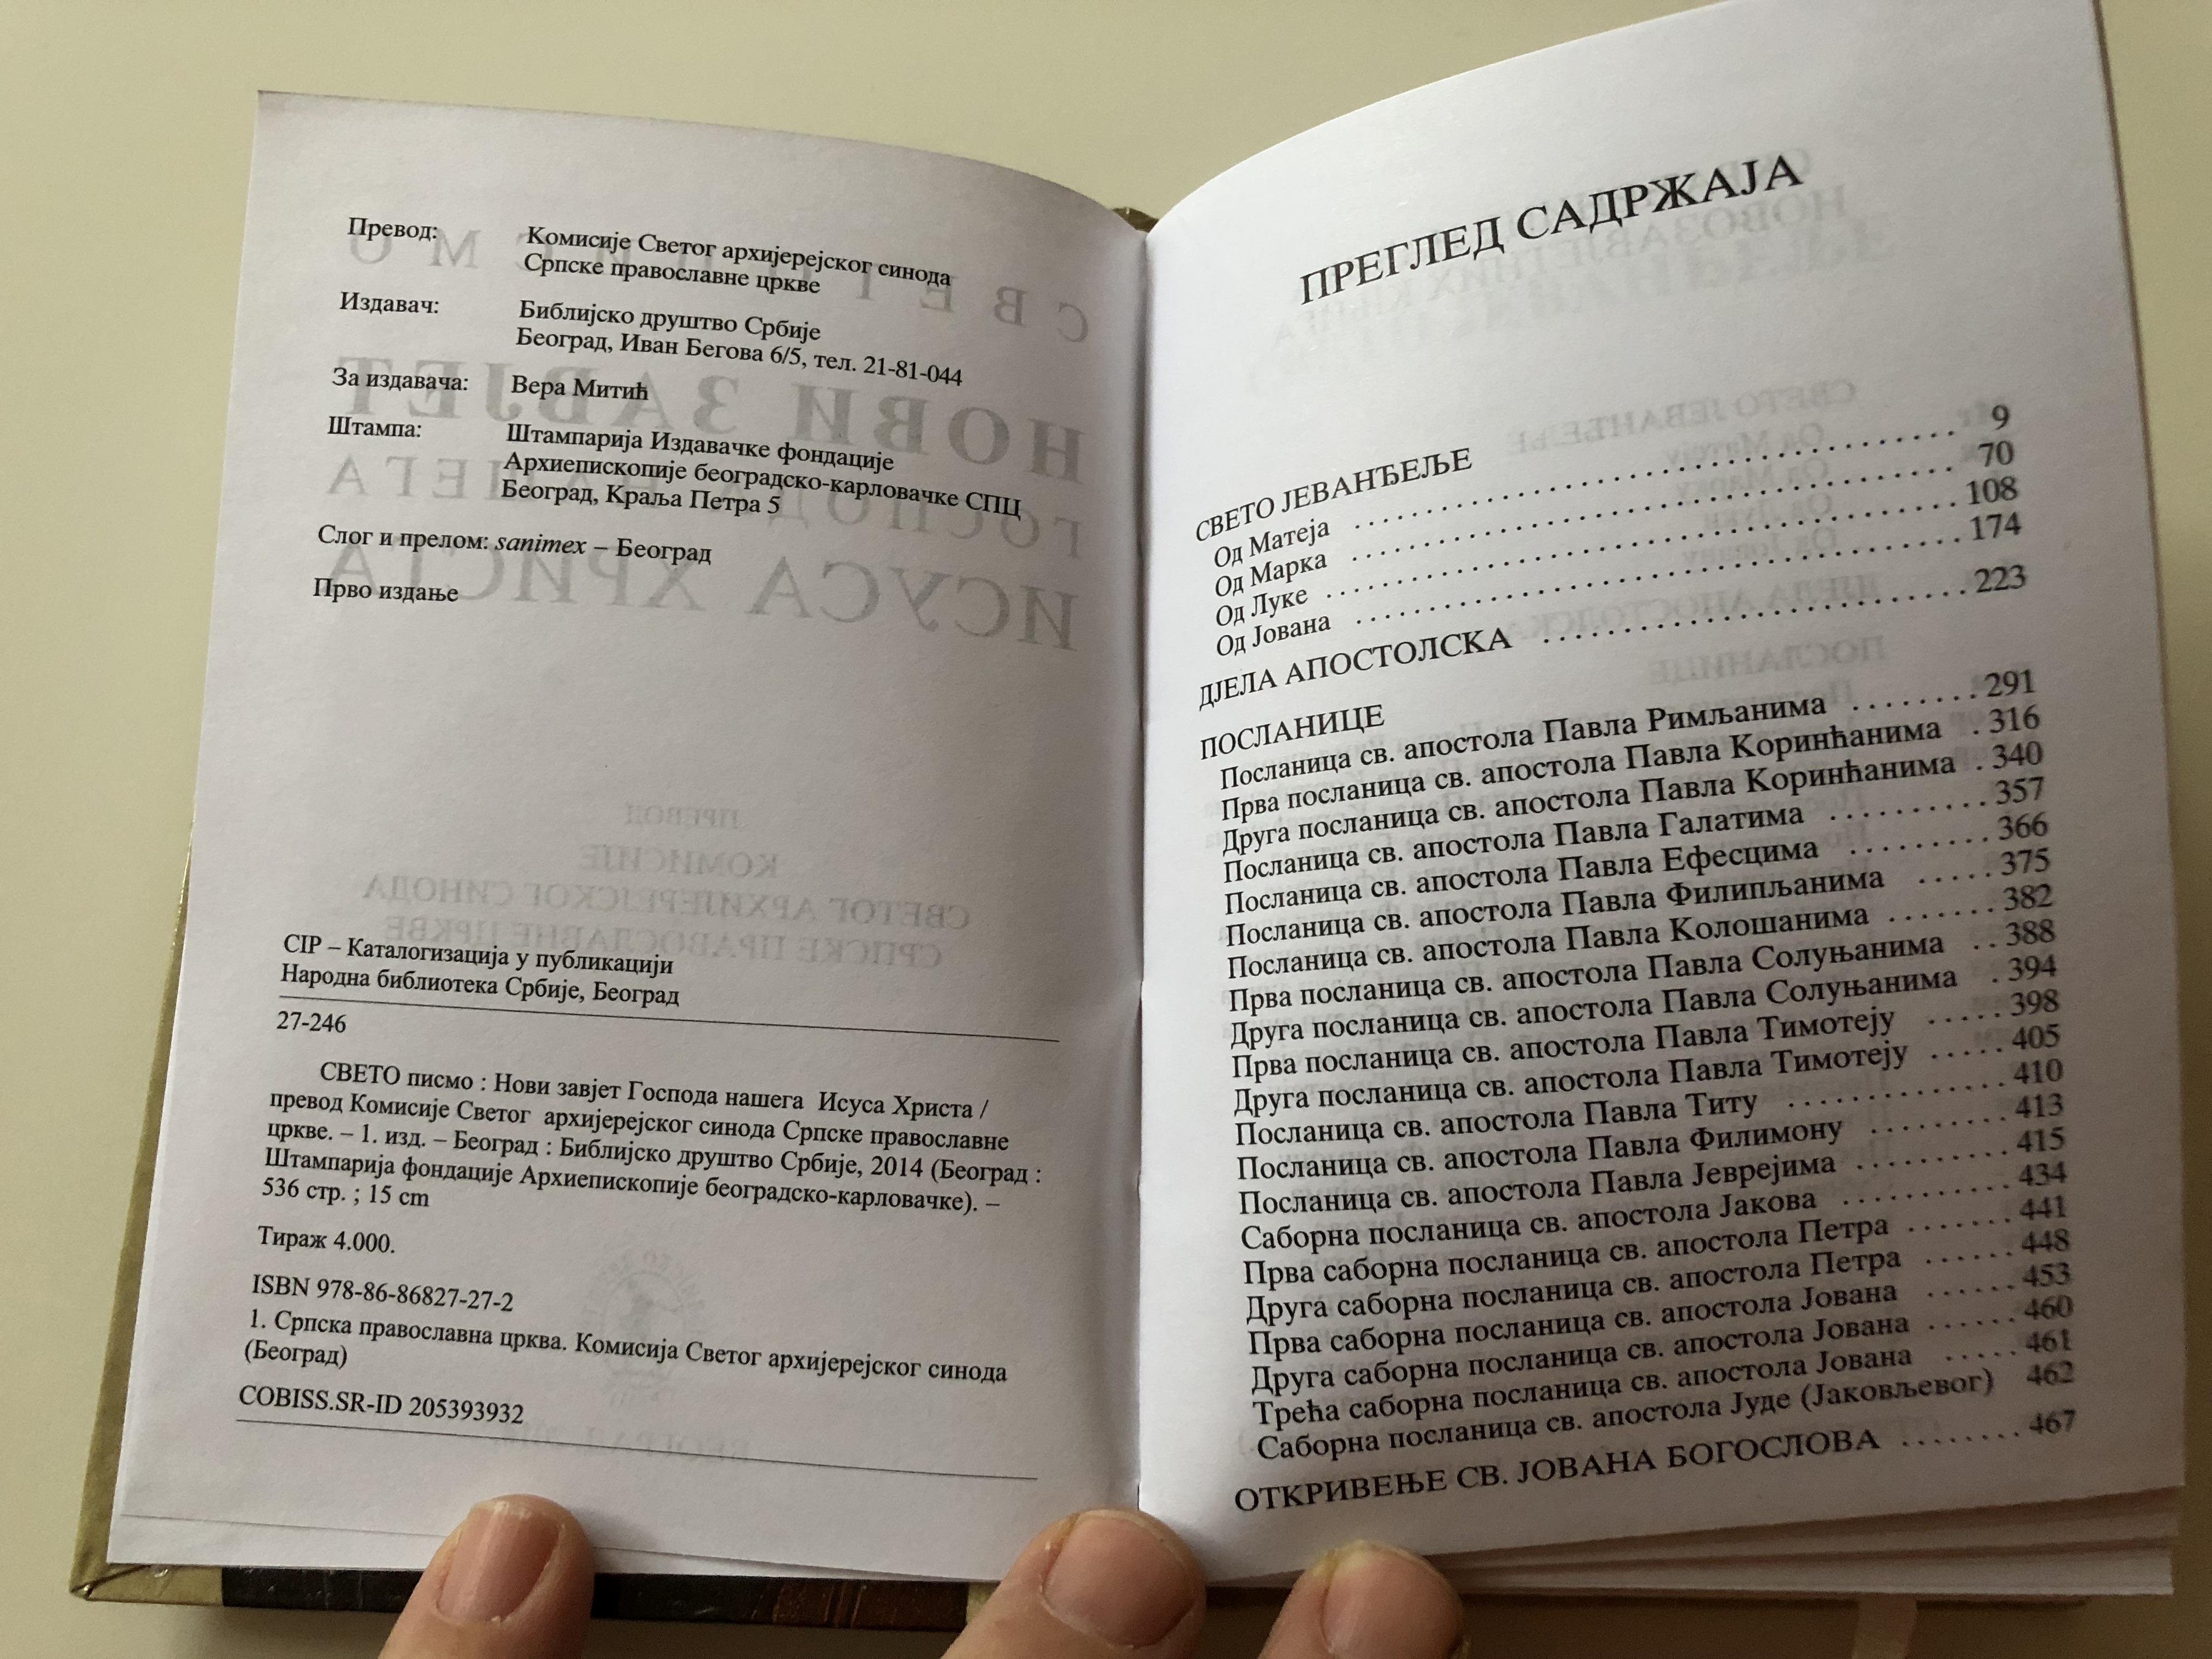 serbian-new-testament-jesus-hardcover-4-.jpg